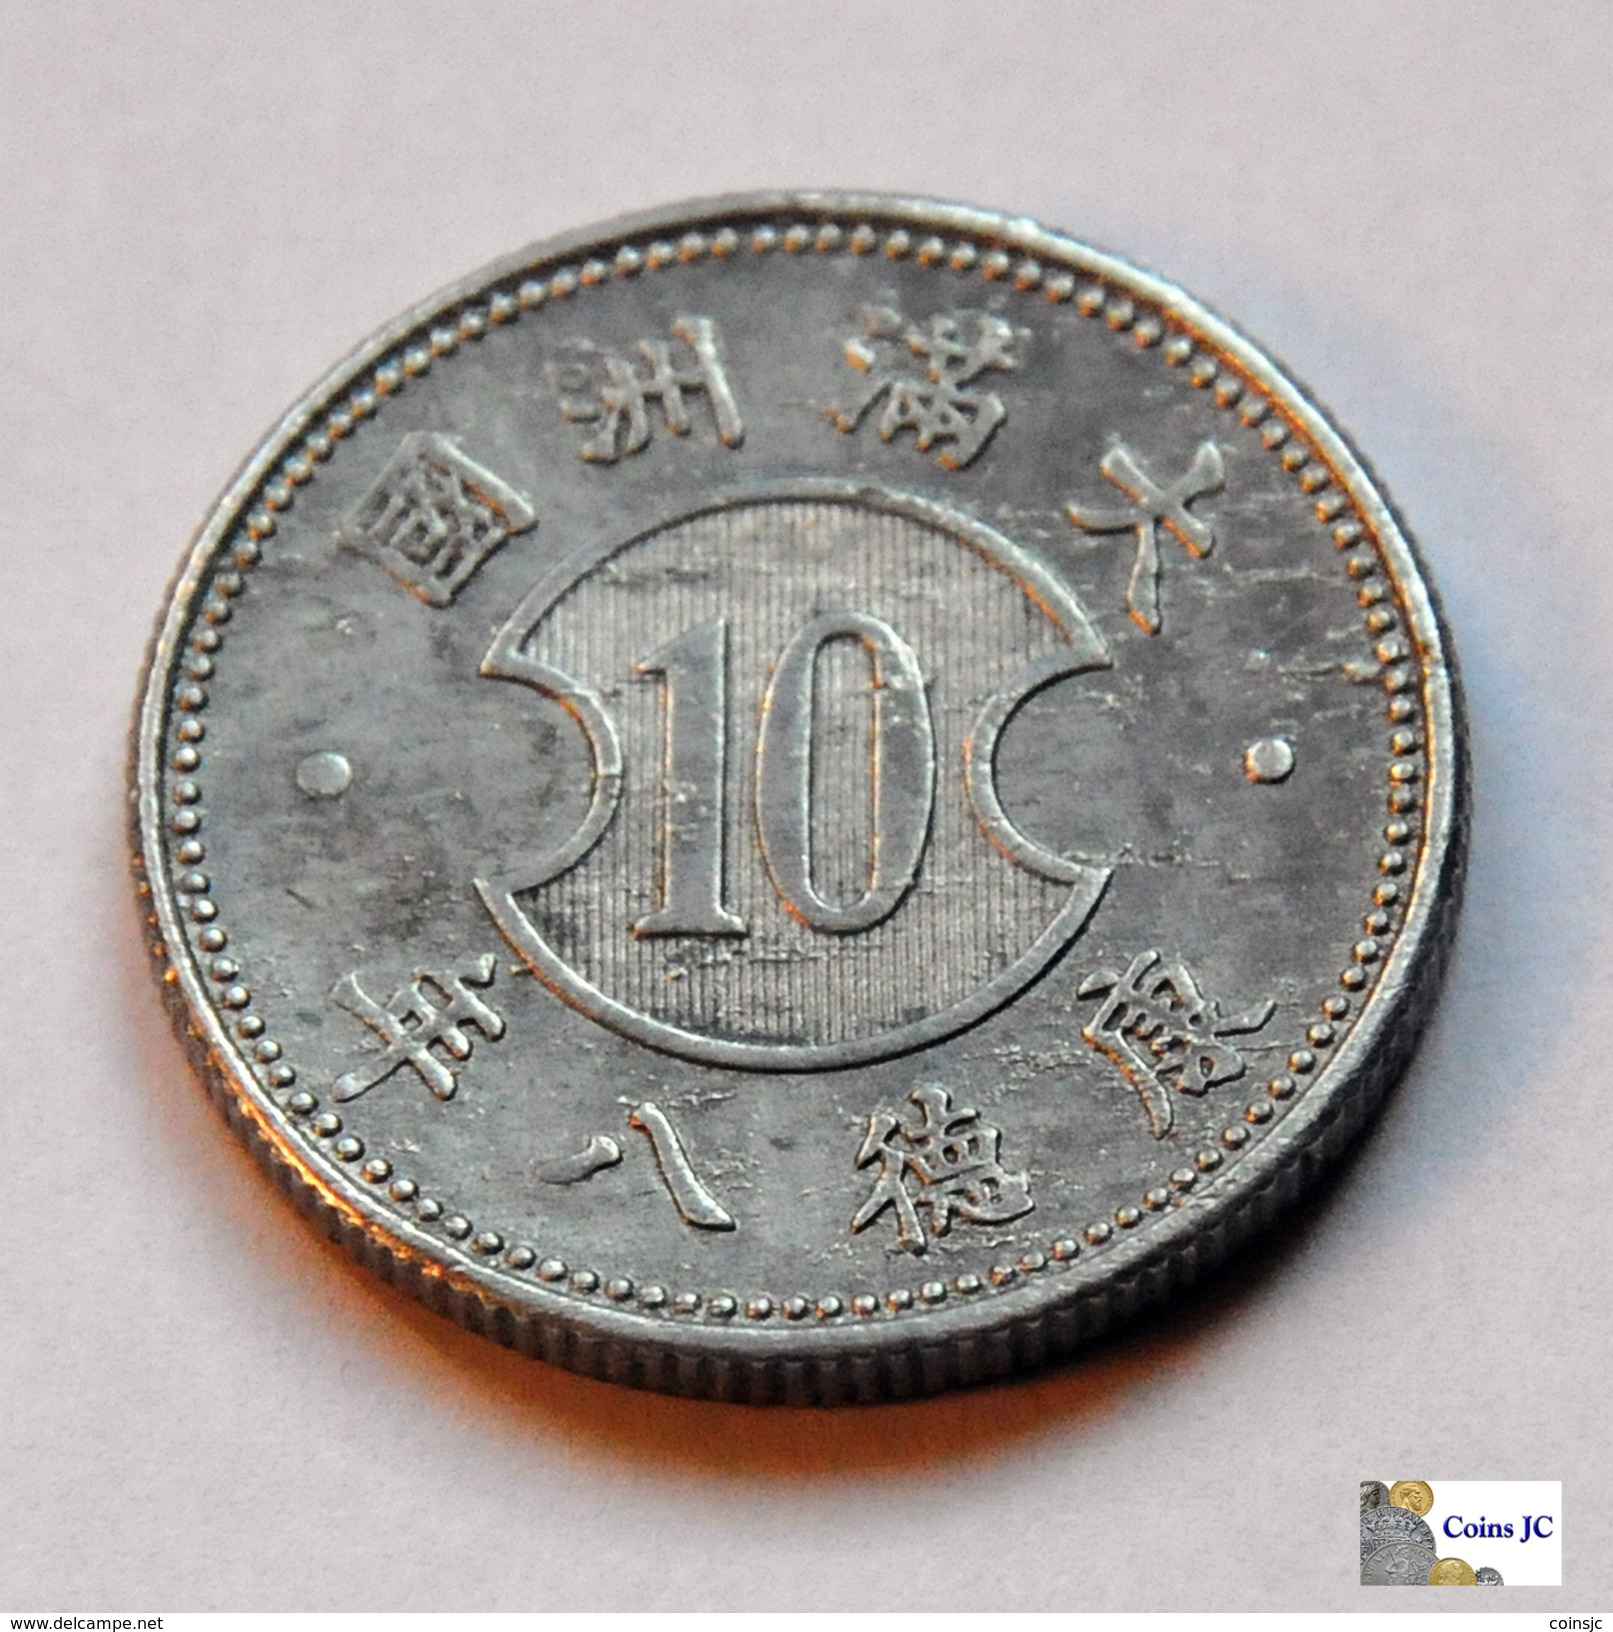 China - Manchoukuo - 1 Chiao (10 Fen) - 1941 - China